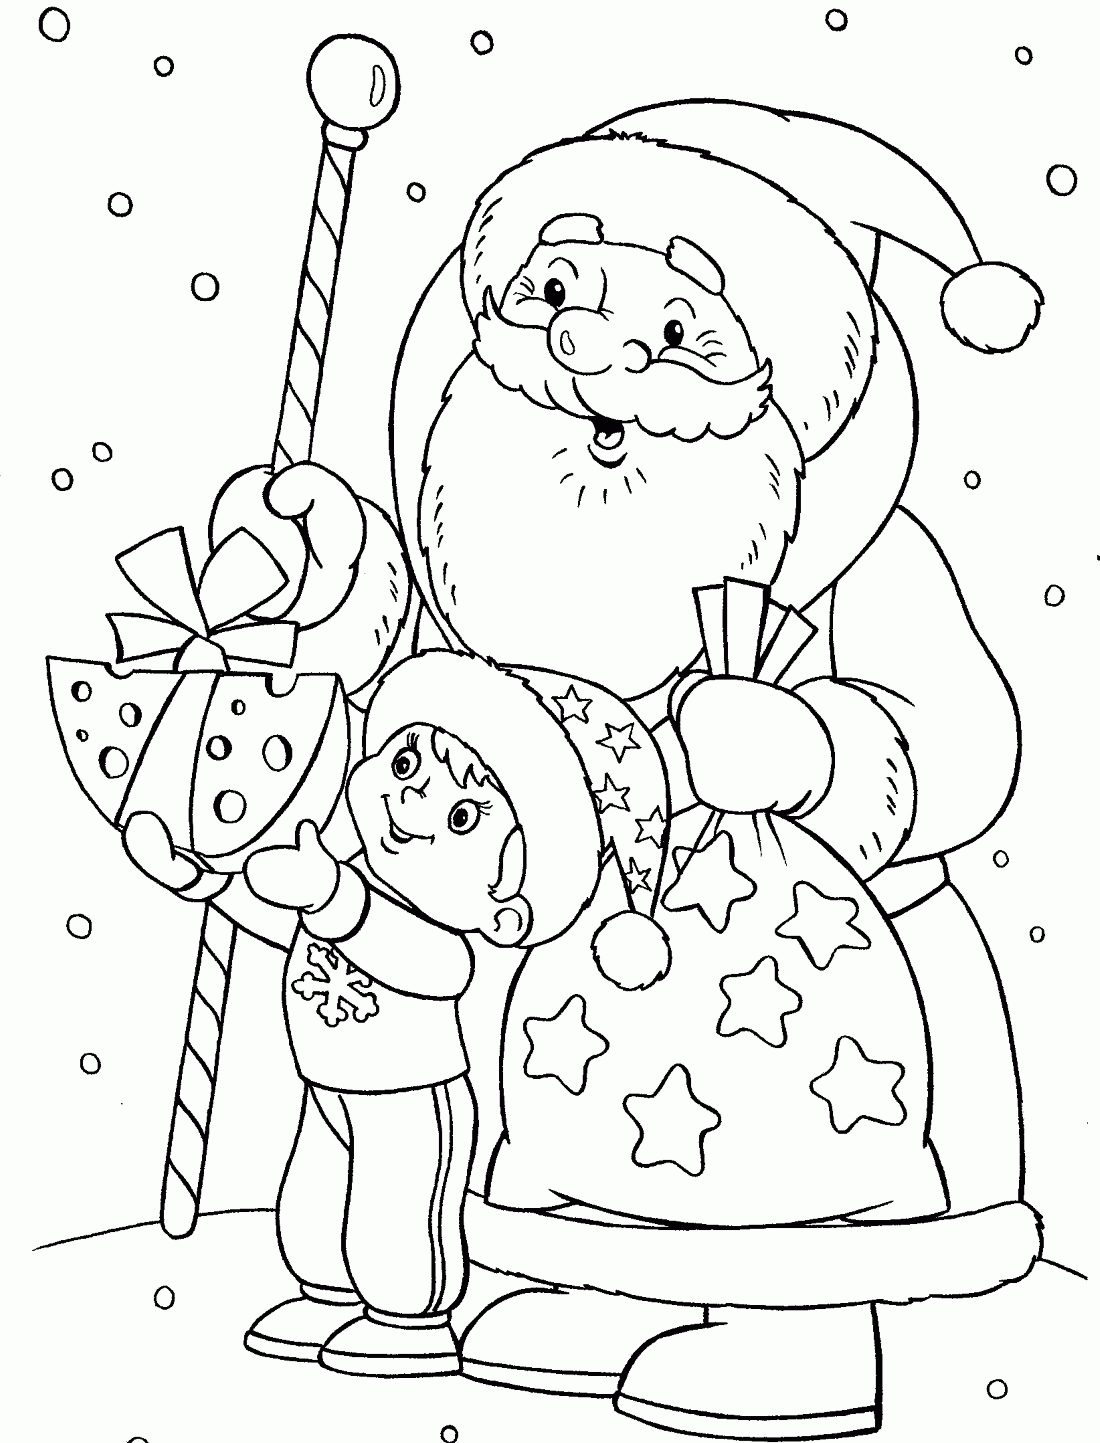 Дед мороз дарит сыр вороне - раскраска №12827 | Printonic.ru